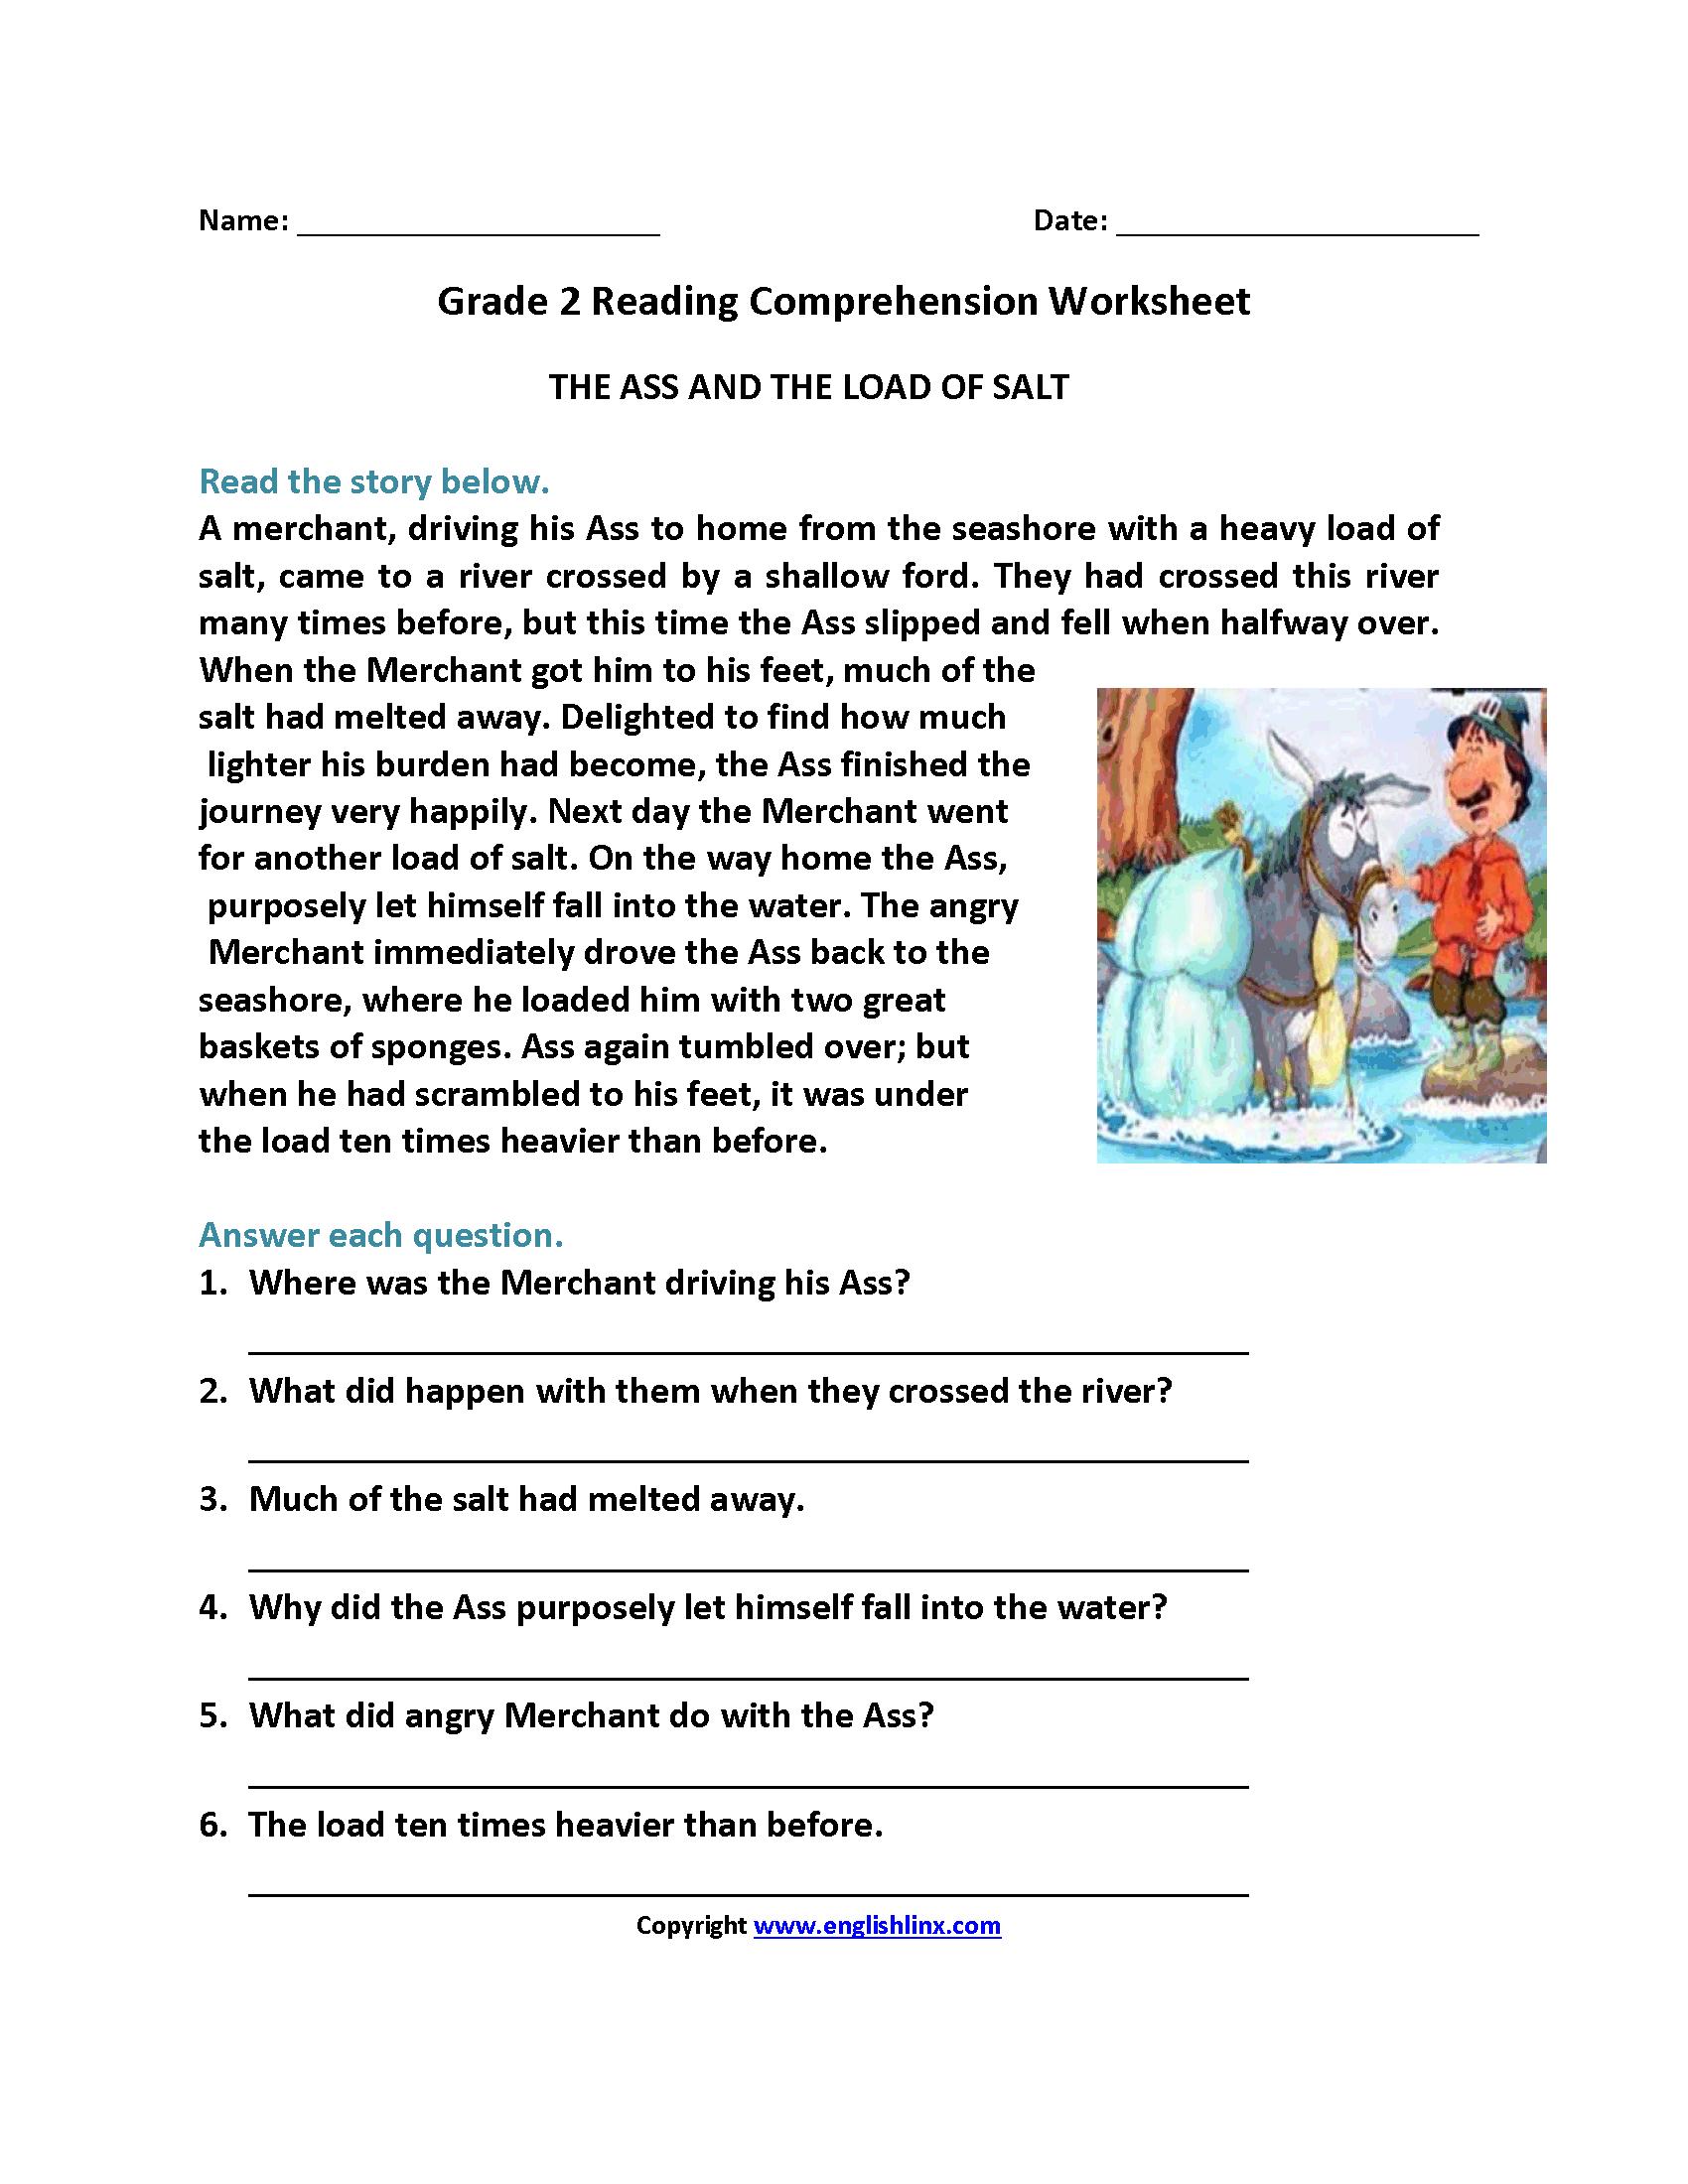 Reading Worksheets  Second Grade Reading Worksheets As Well As Reading Comprehension Worksheets For 2Nd Grade